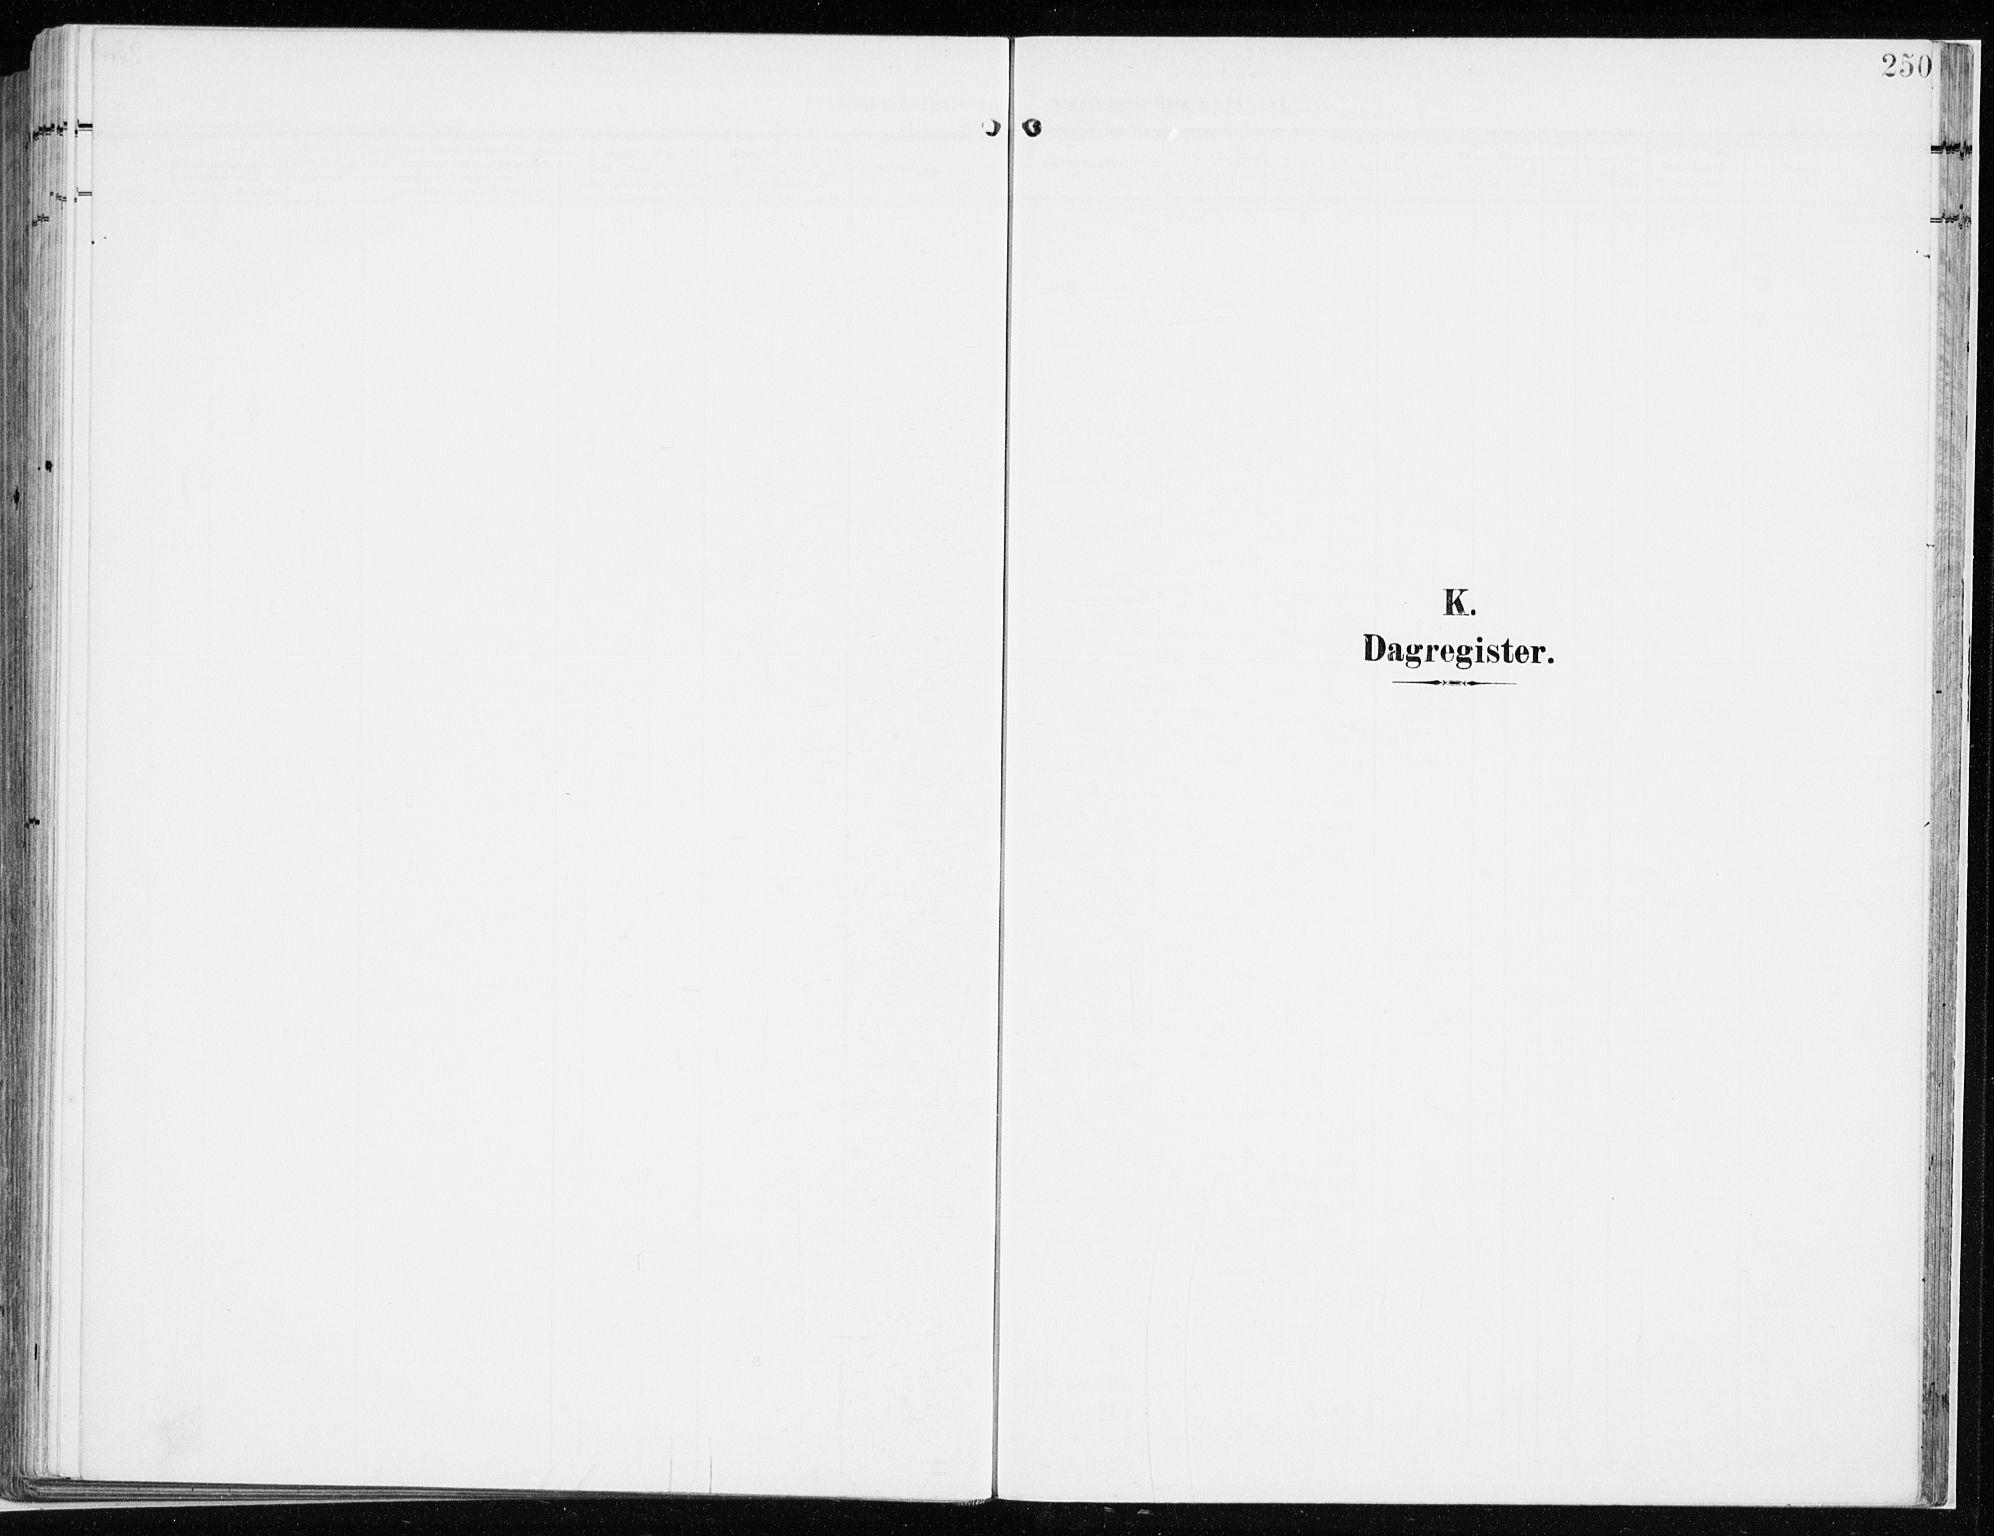 SAH, Løten prestekontor, K/Ka/L0011: Ministerialbok nr. 11, 1908-1917, s. 250